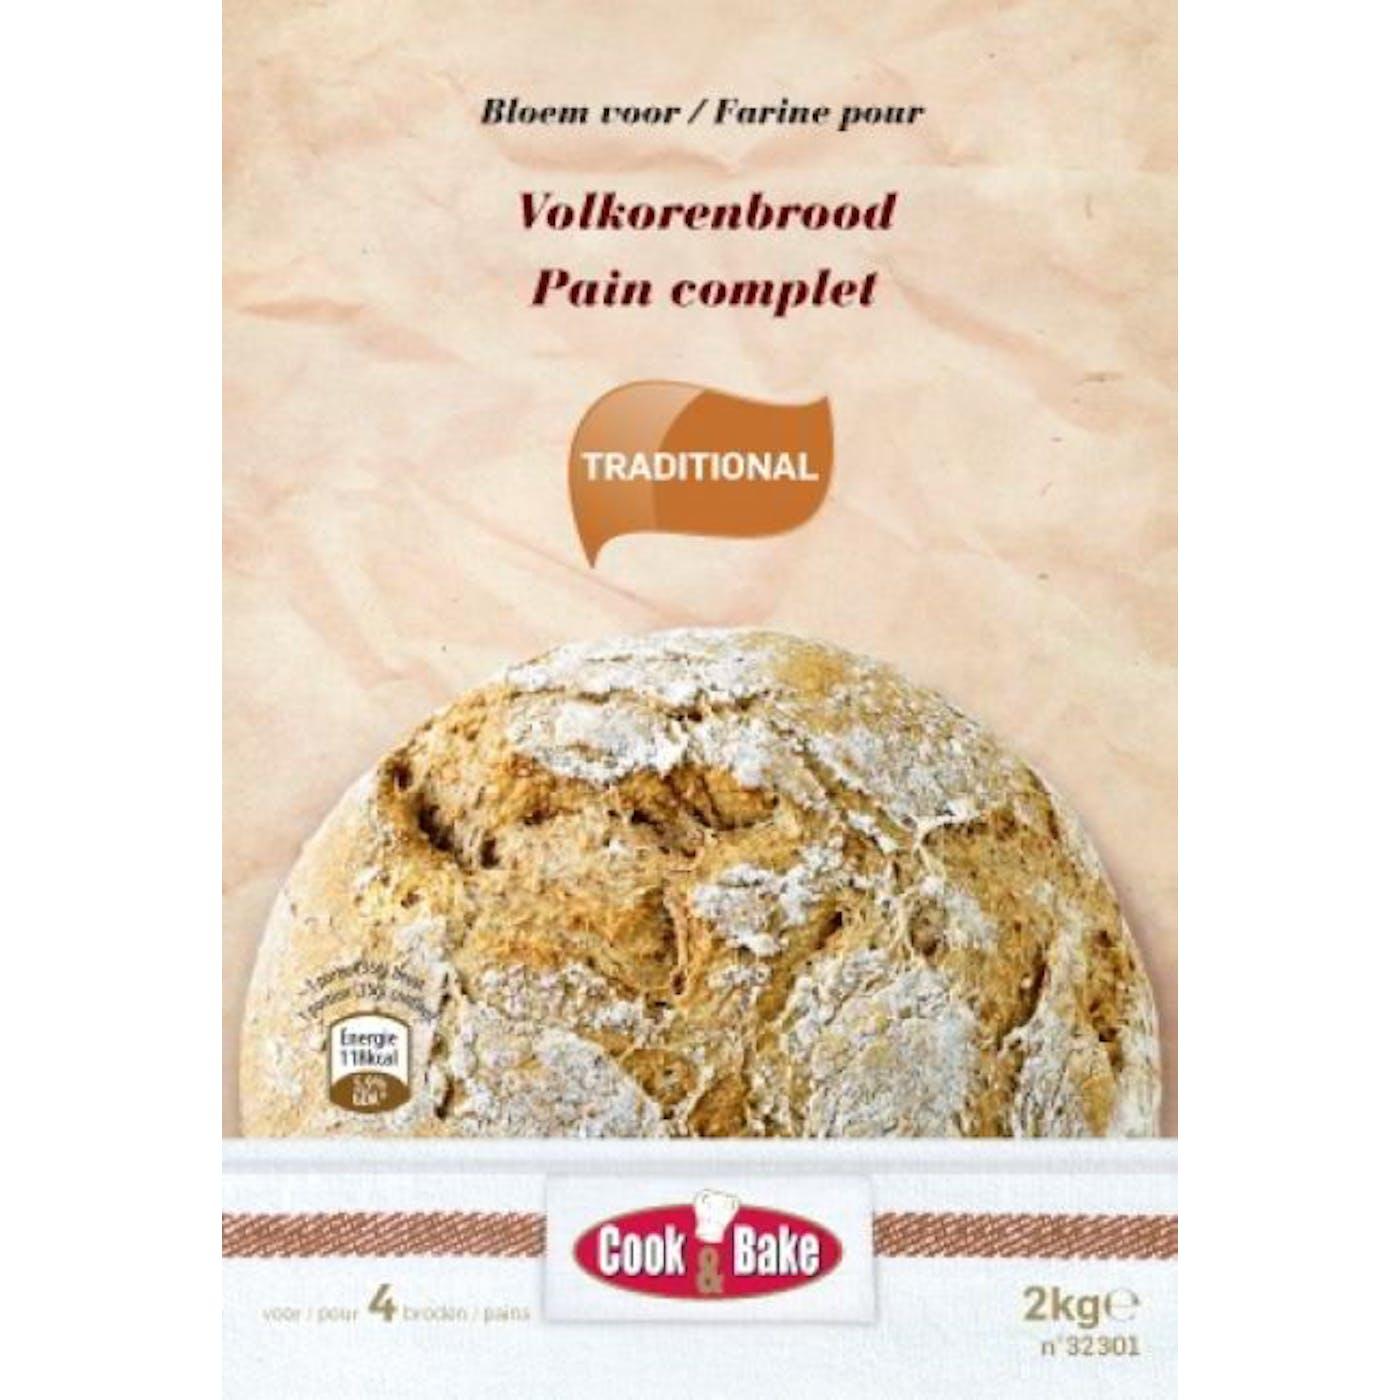 Artisanale bloem voor volkorenbrood 2kg Cook&Bake